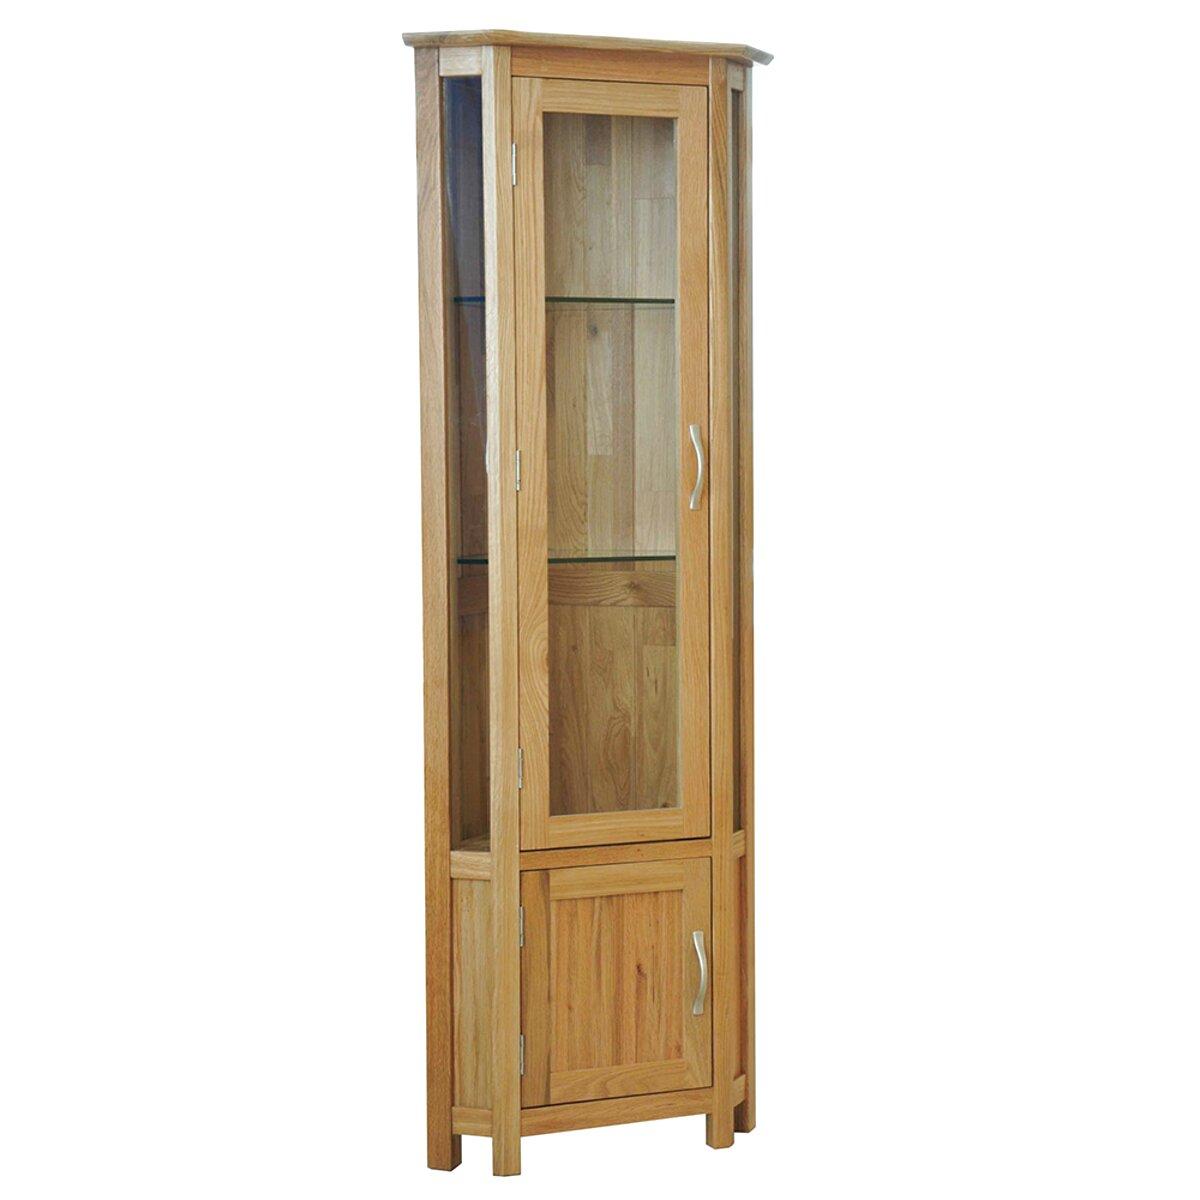 Second hand Corner Display Cabinets in Ireland